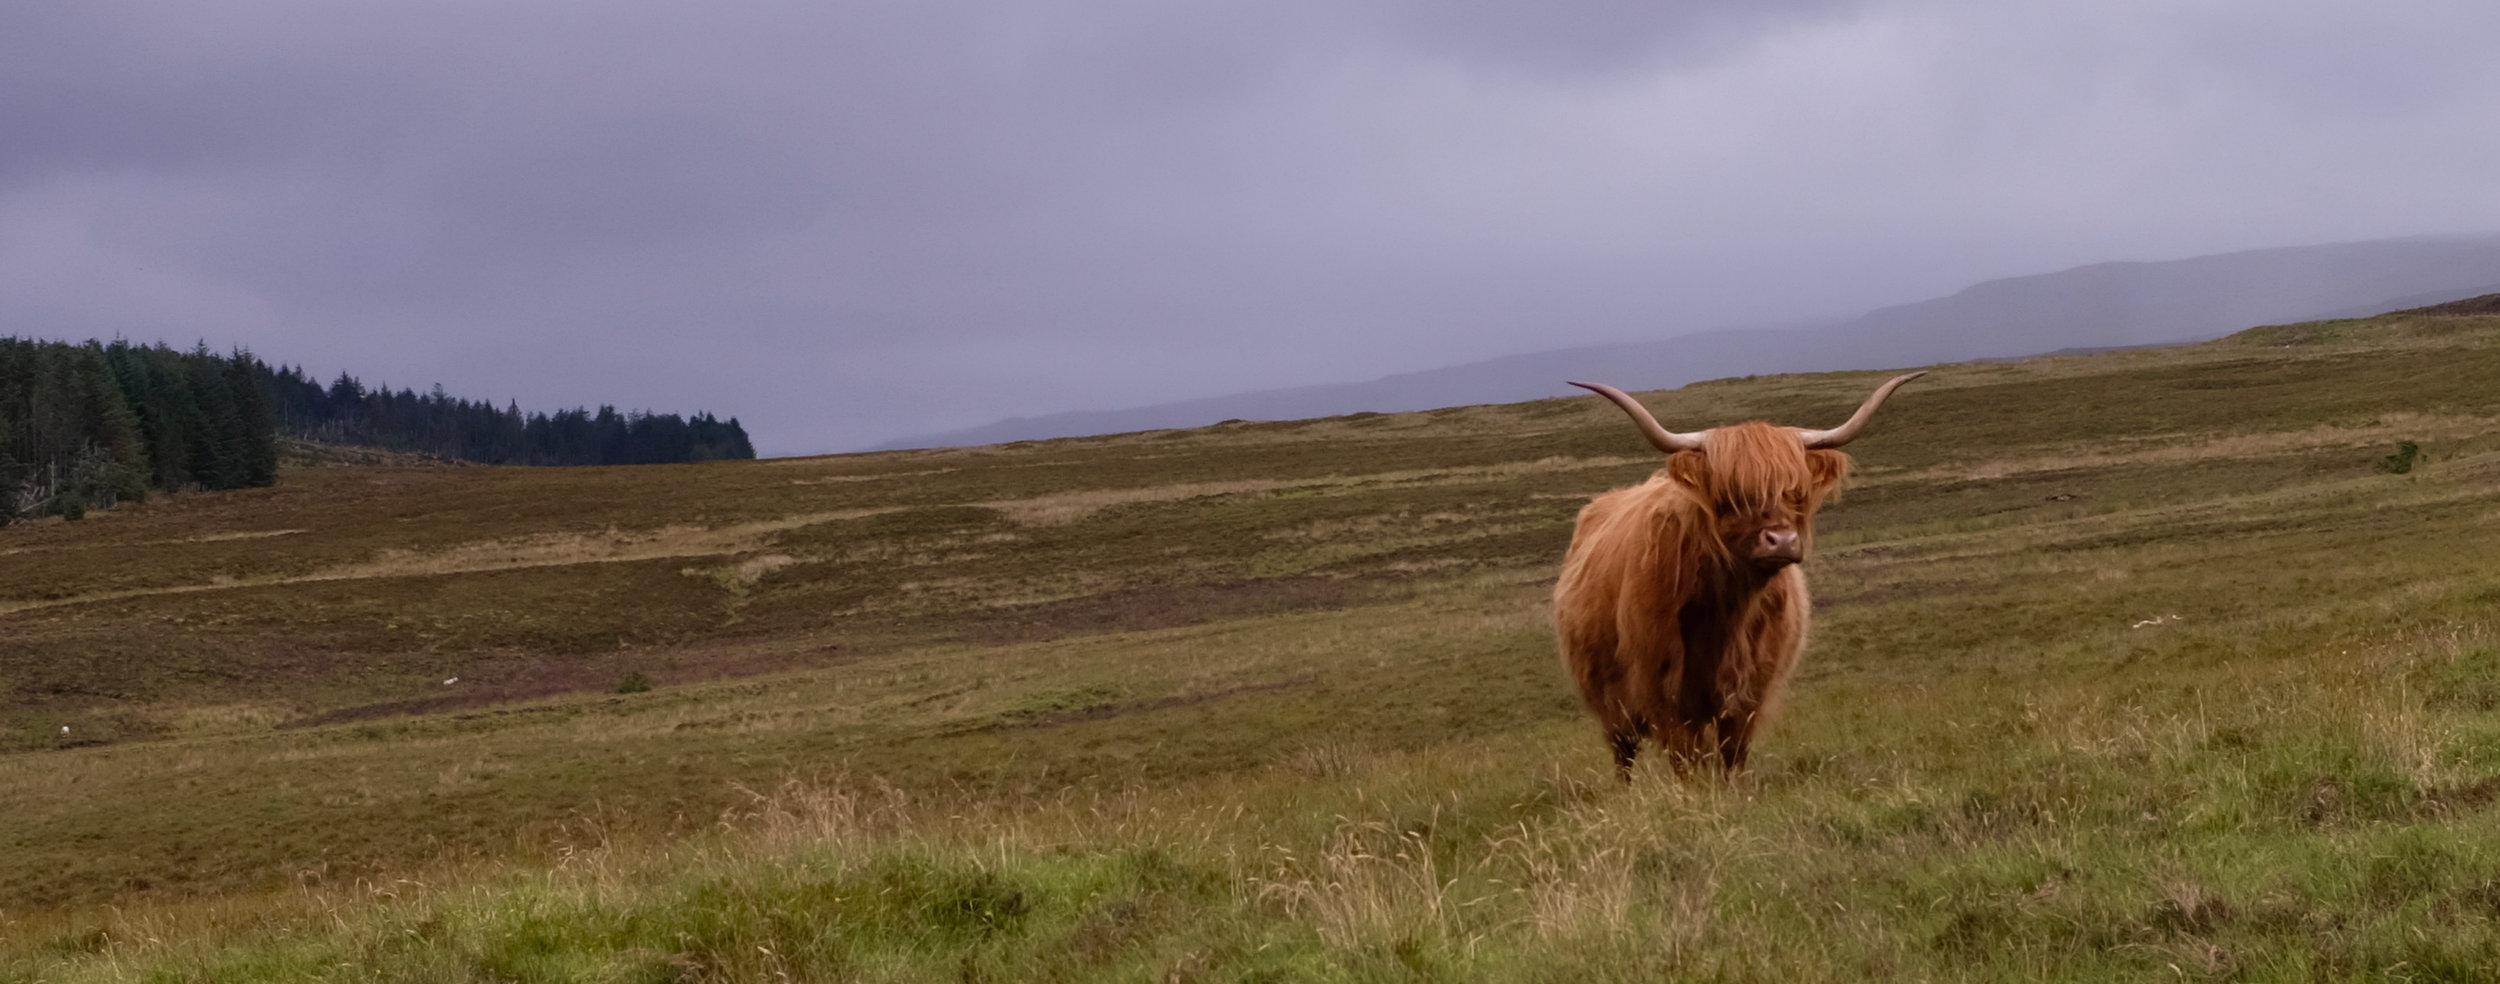 Isle of Skye Schottland Reiseblog Galloway